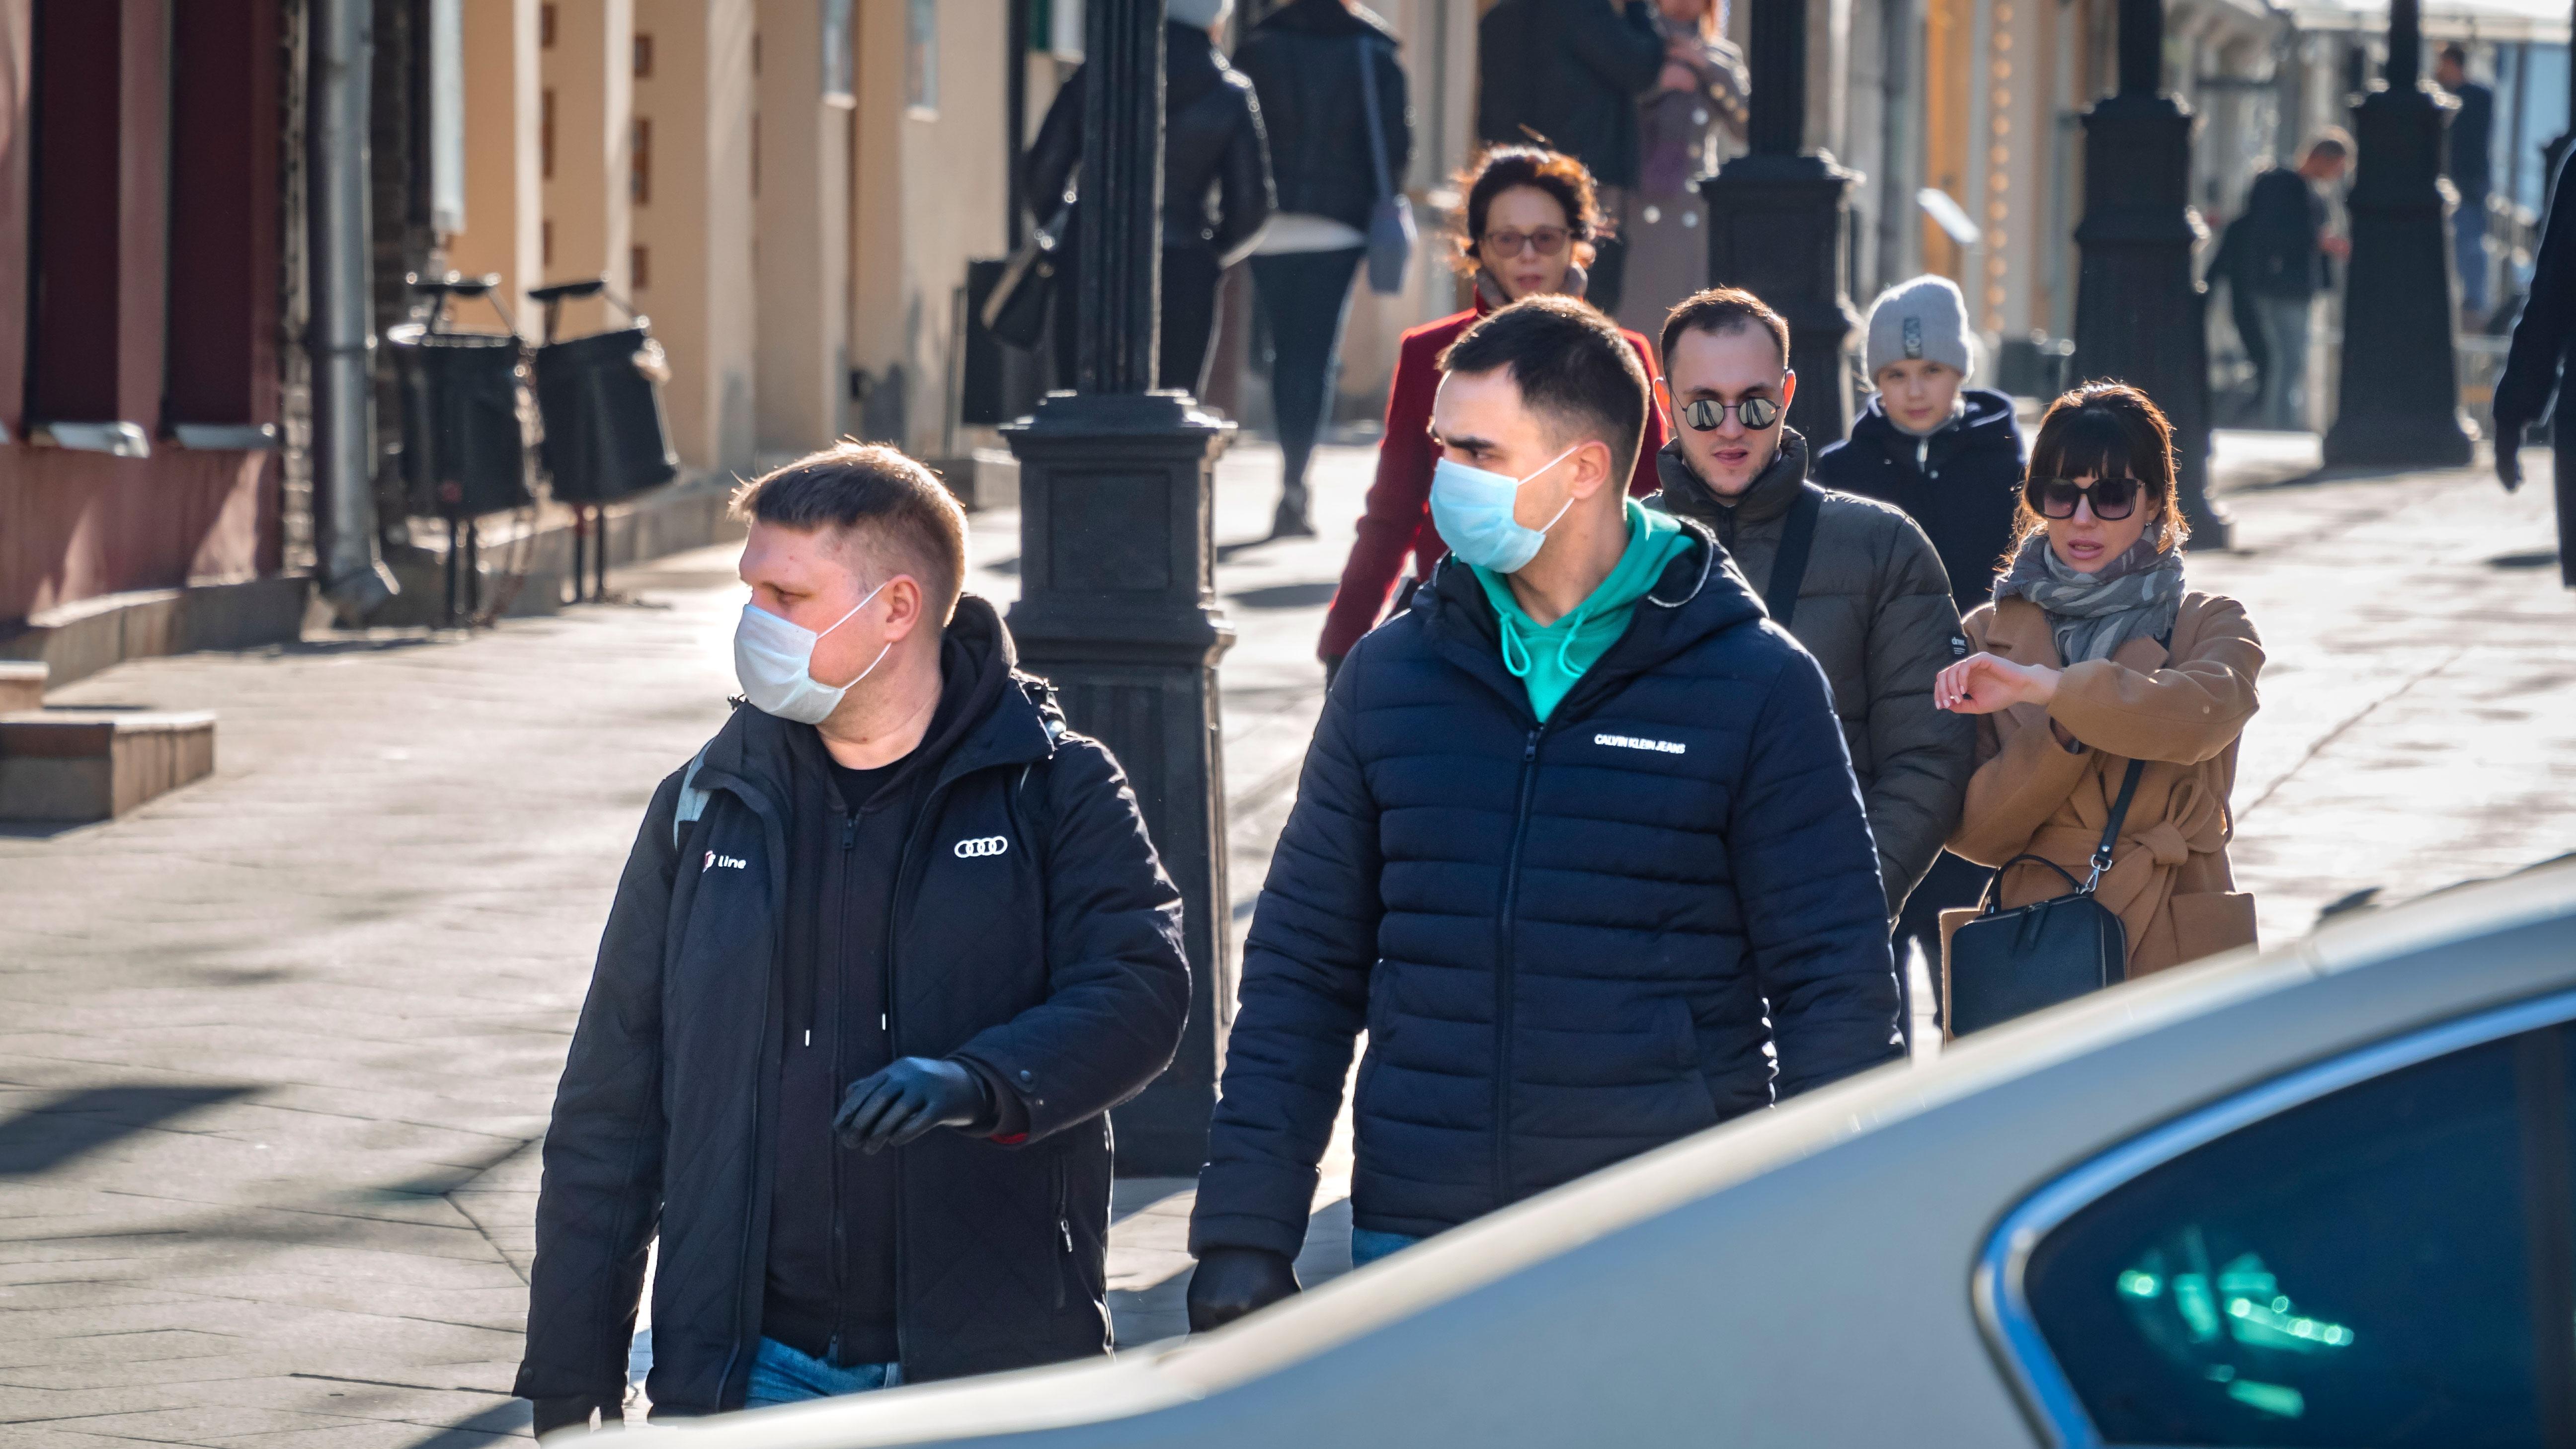 За сутки в 26 регионах РФ зафиксировано 228 случаев коронавируса